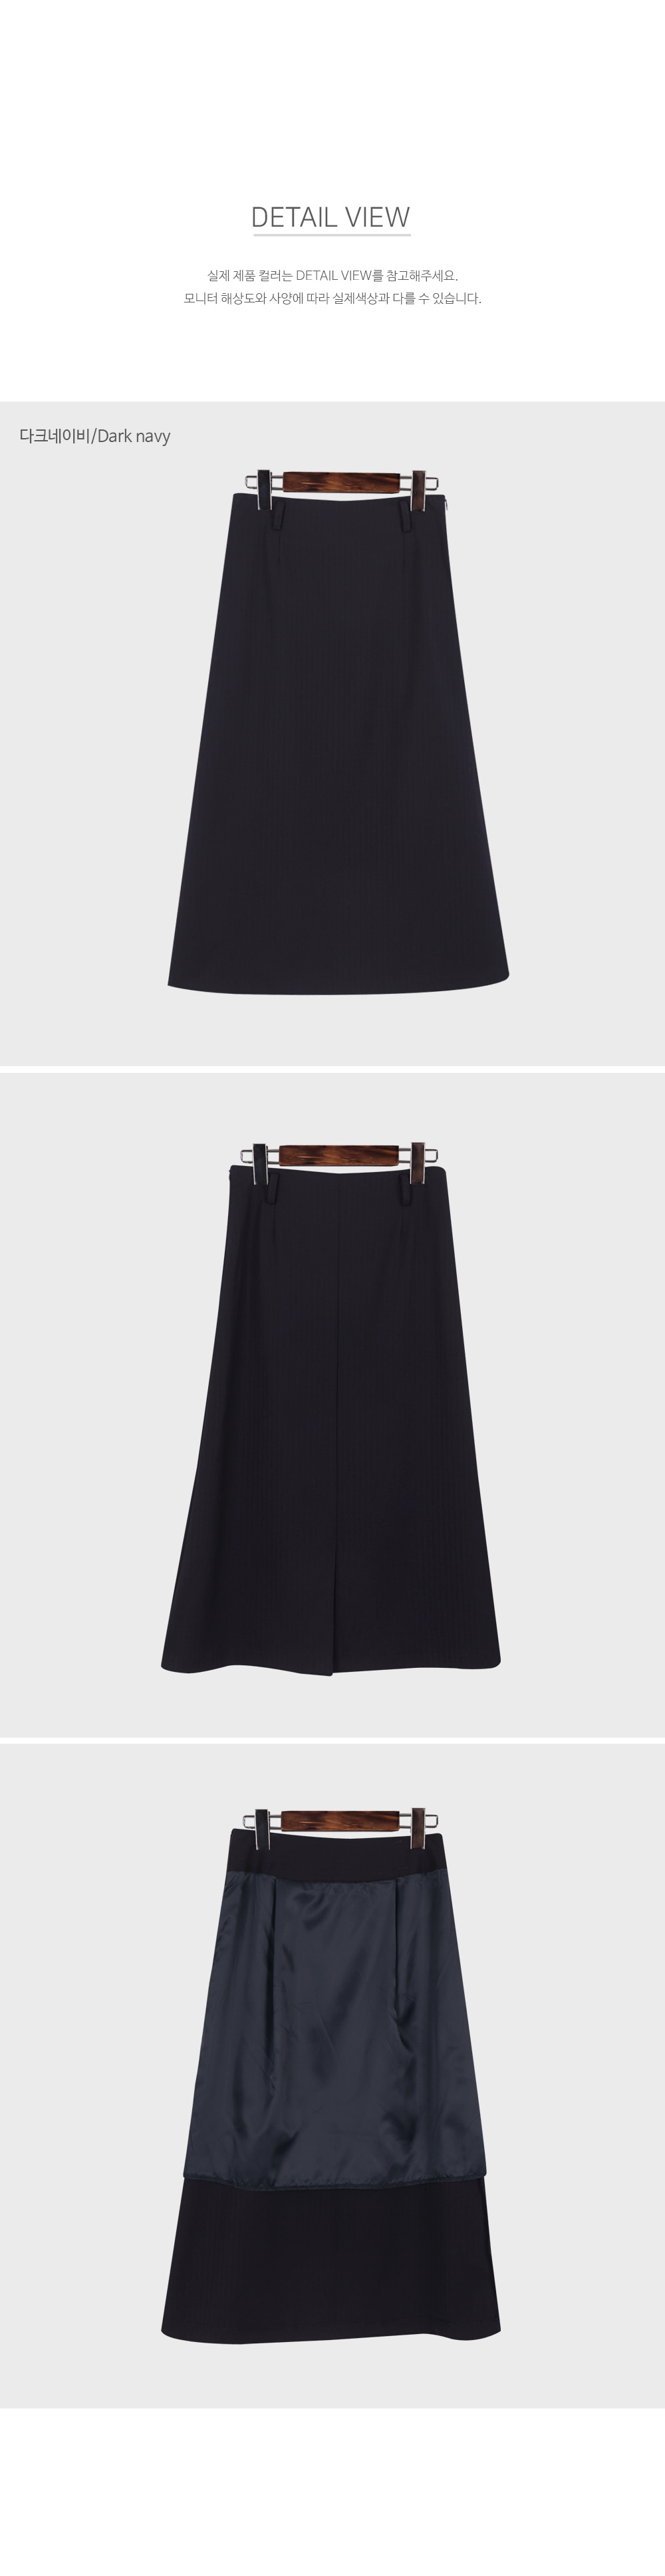 Herringbone Classic Long Skirt-holiholic.com